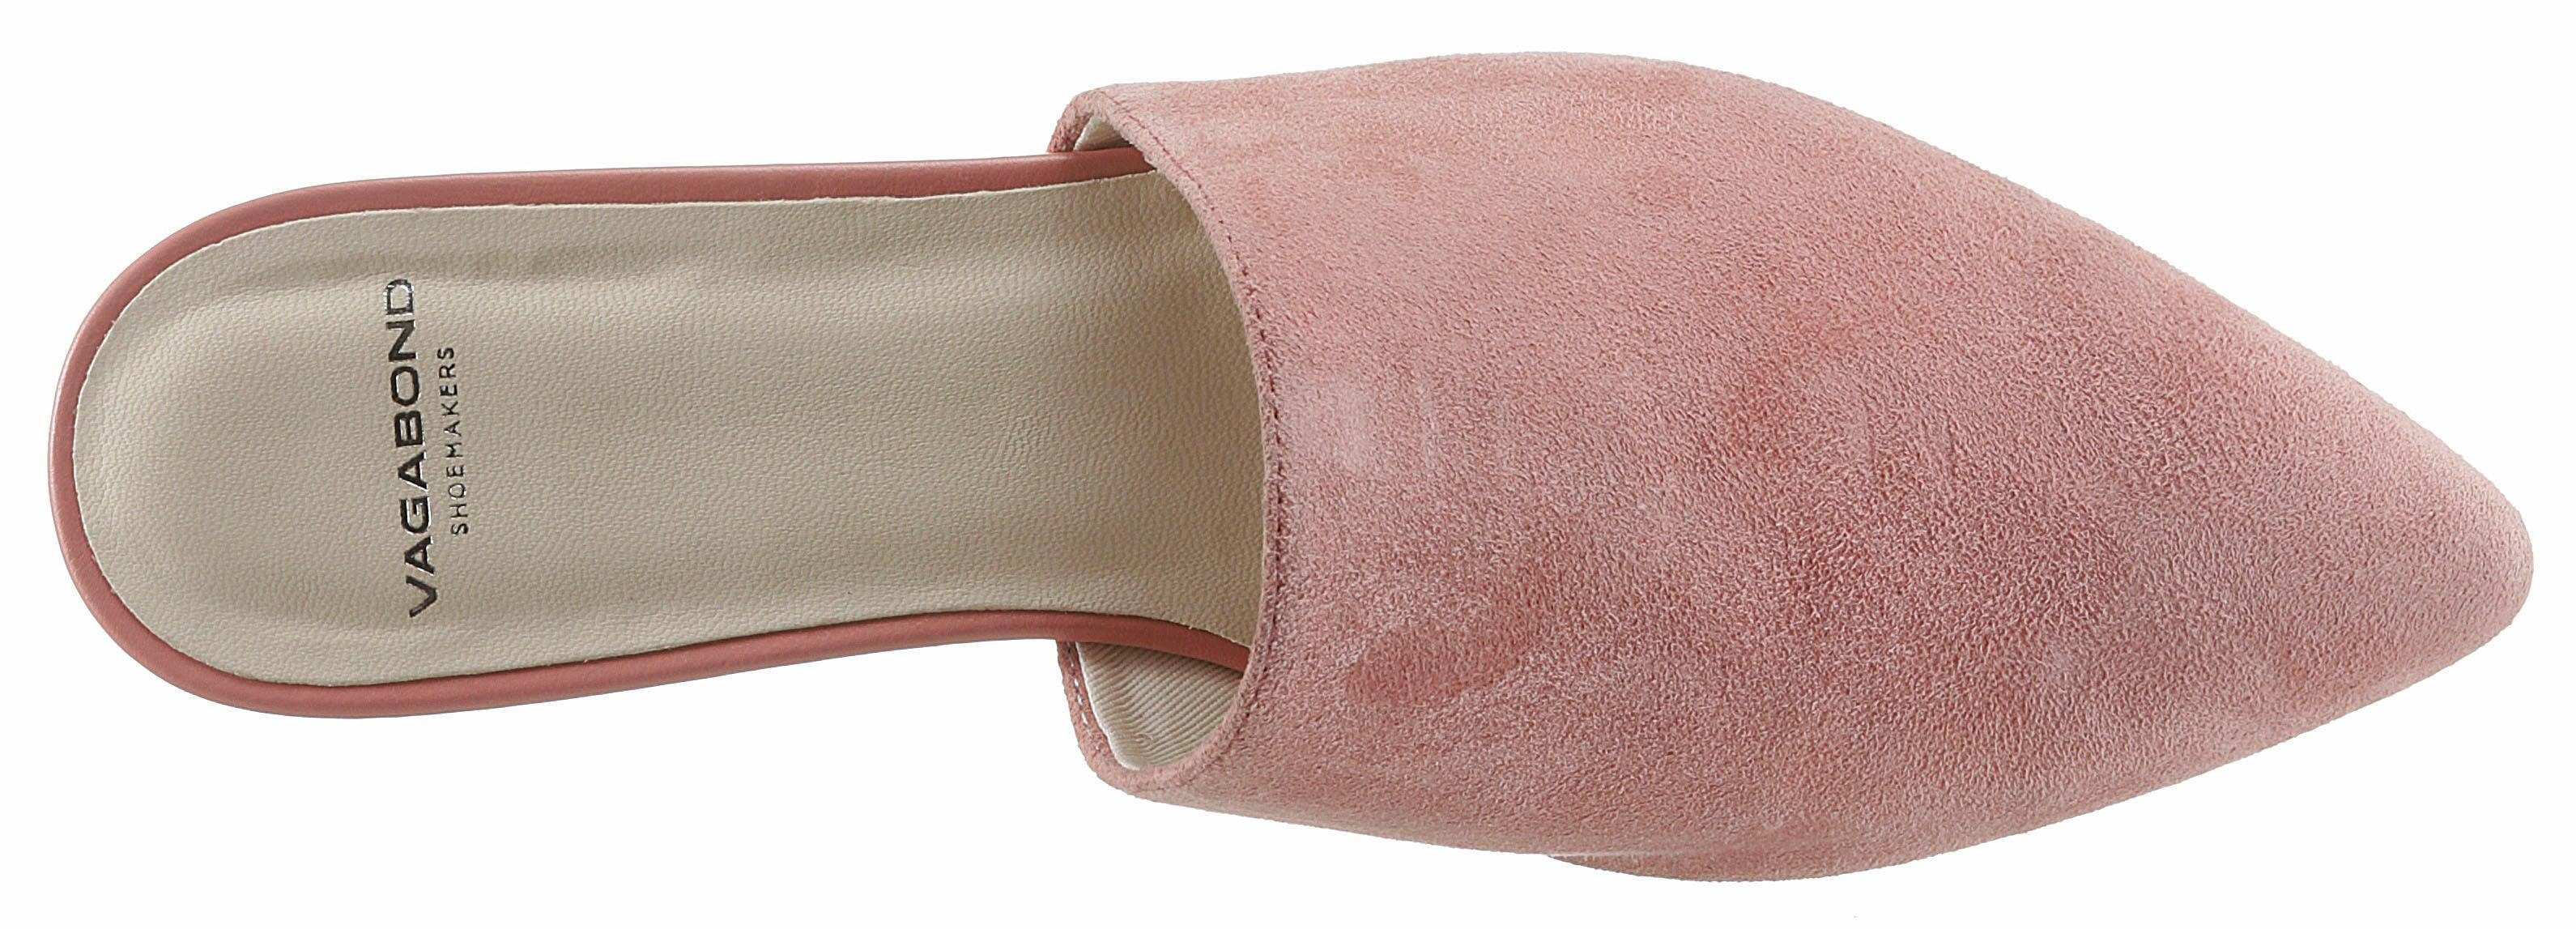 Vagabond Pantolette, in spitzer Form online kaufen  rosé